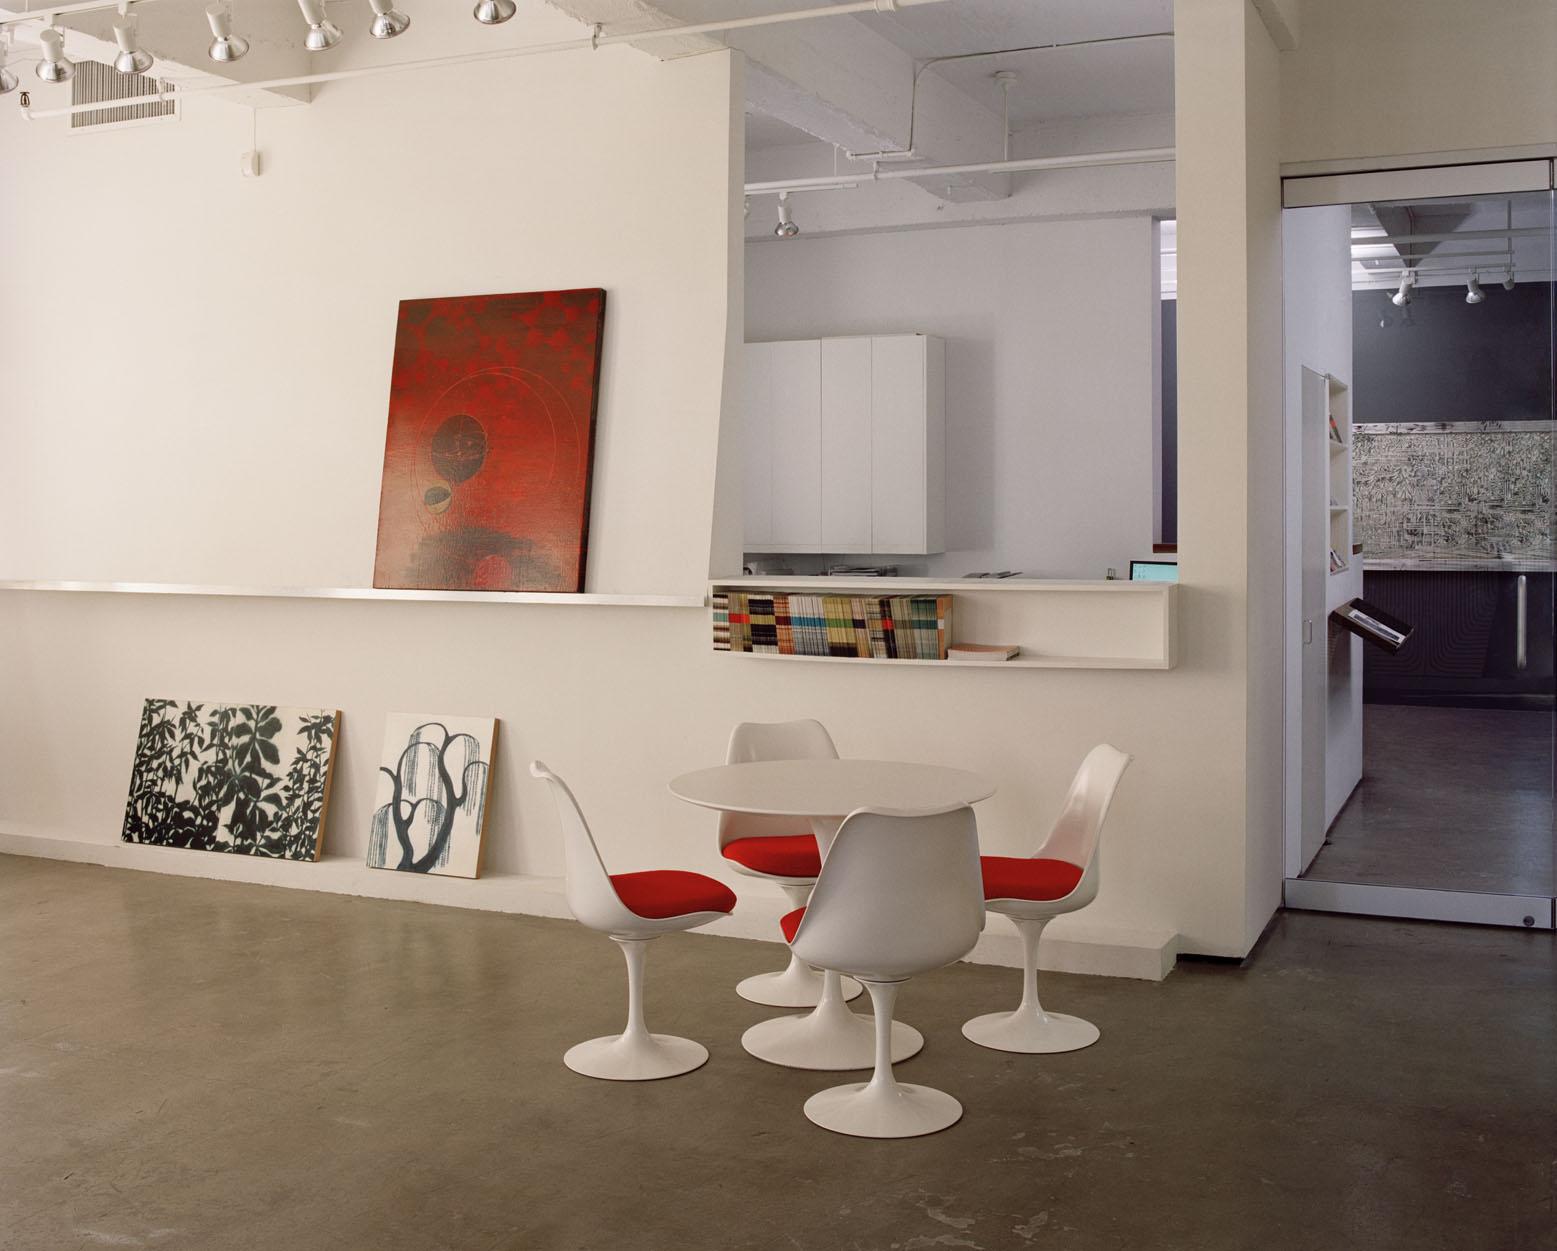 Sears Payton Gallery